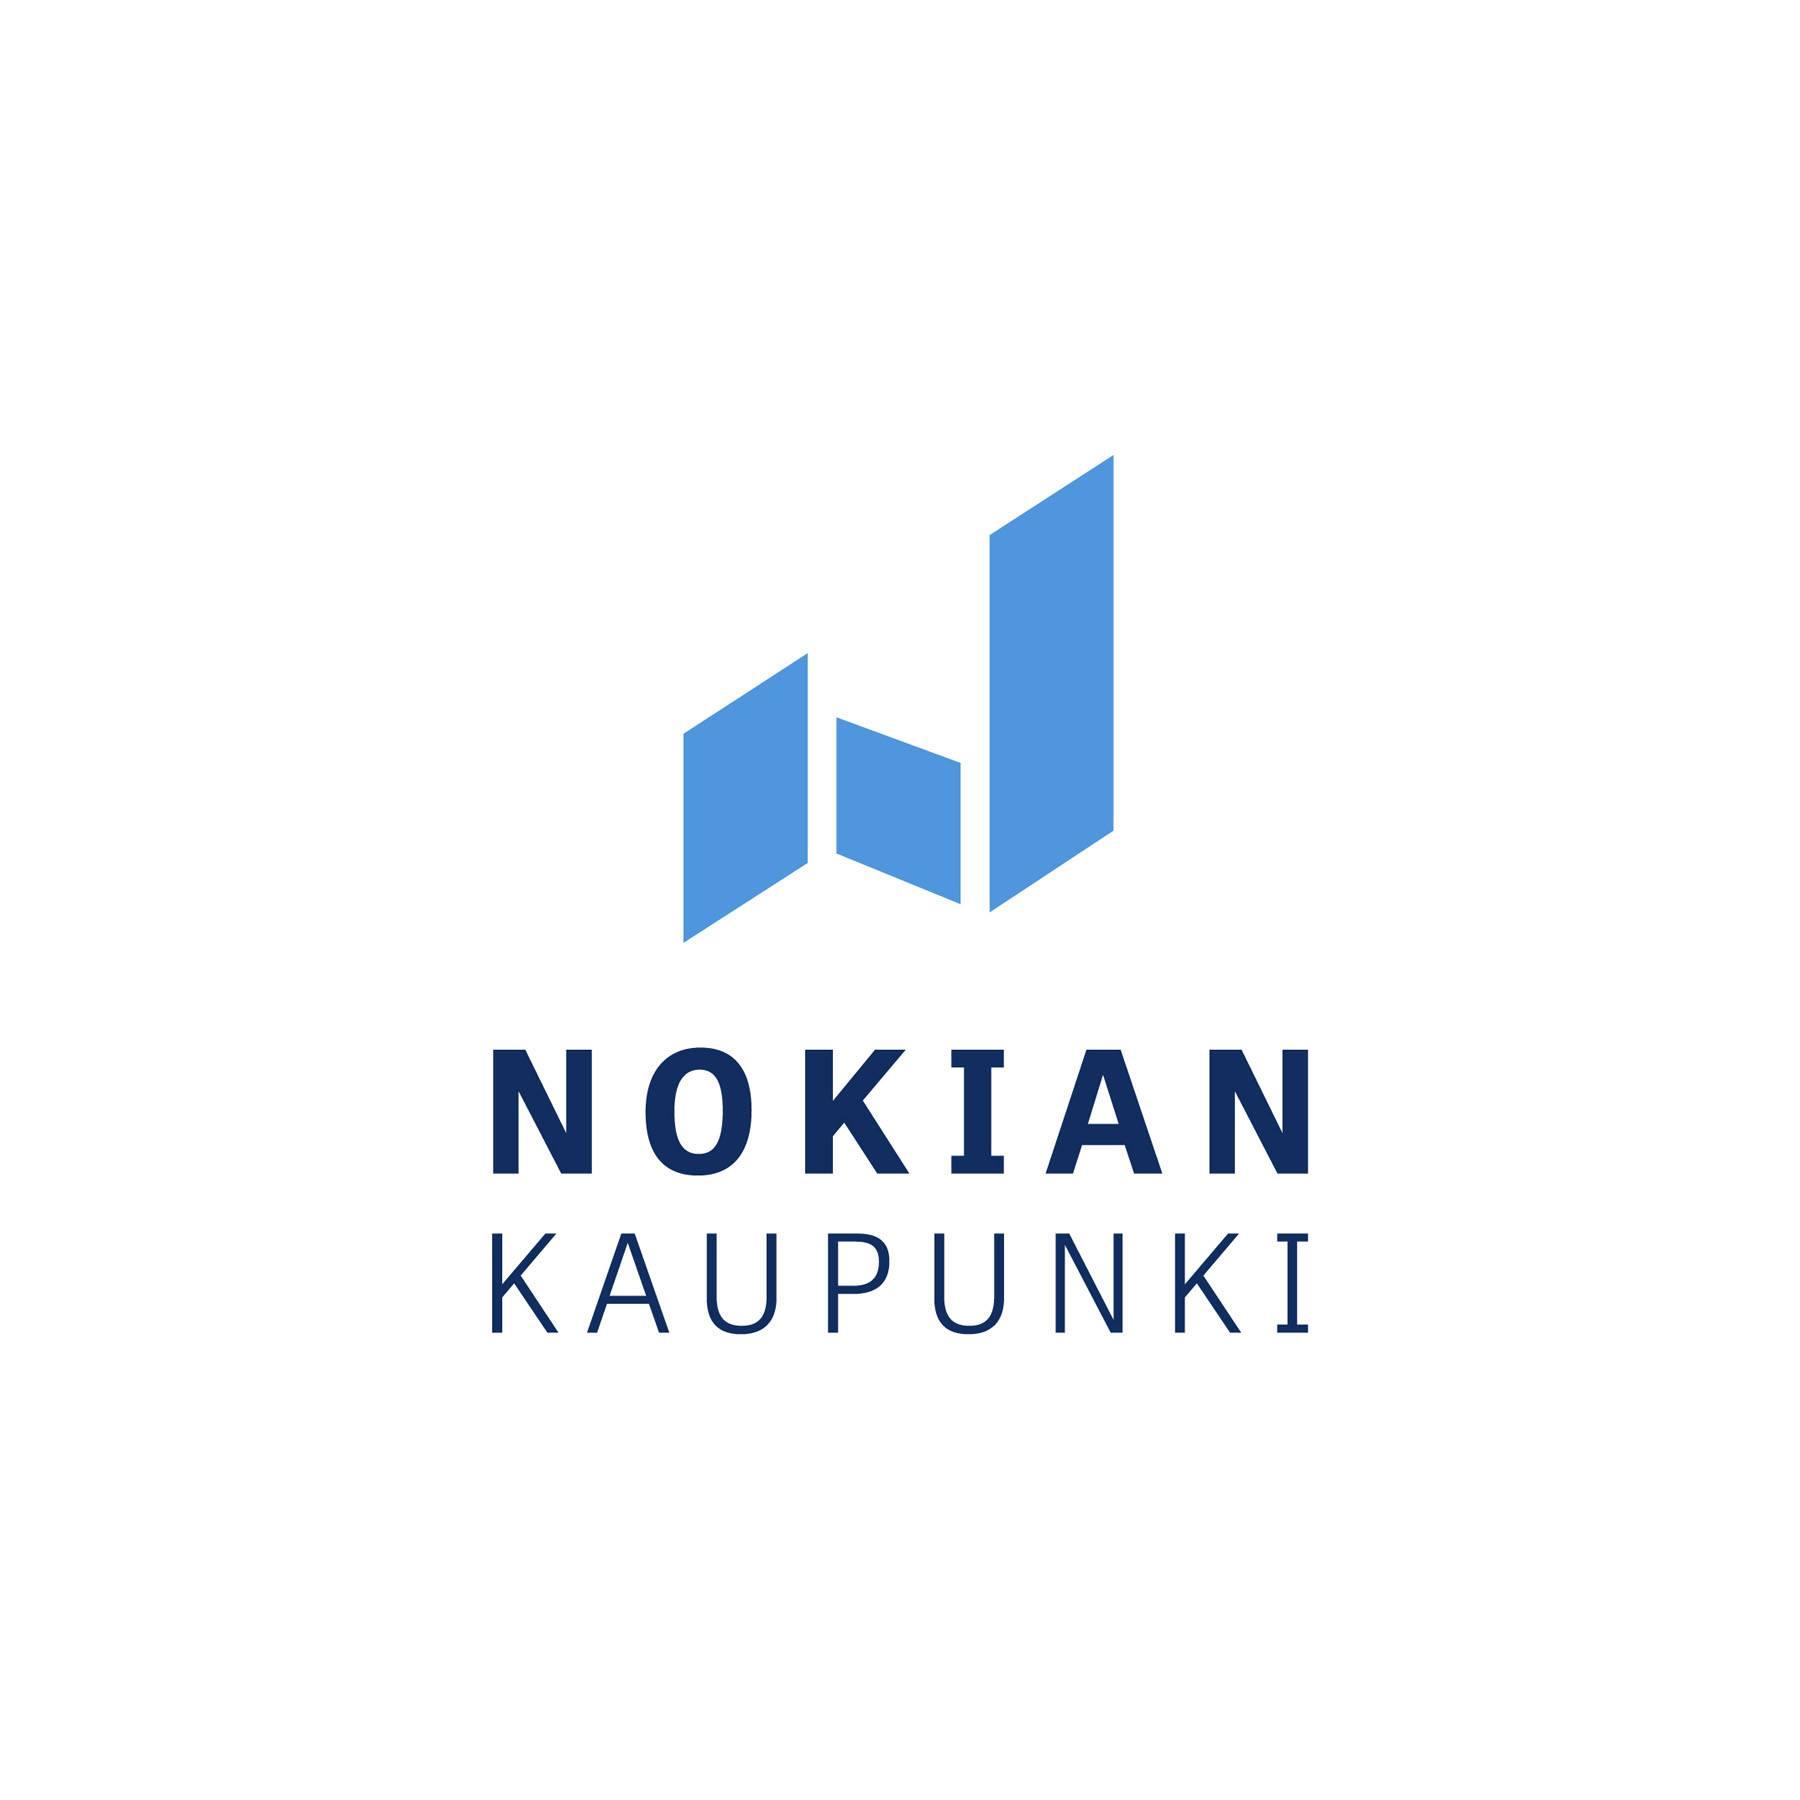 logo: Nokian kaupunki